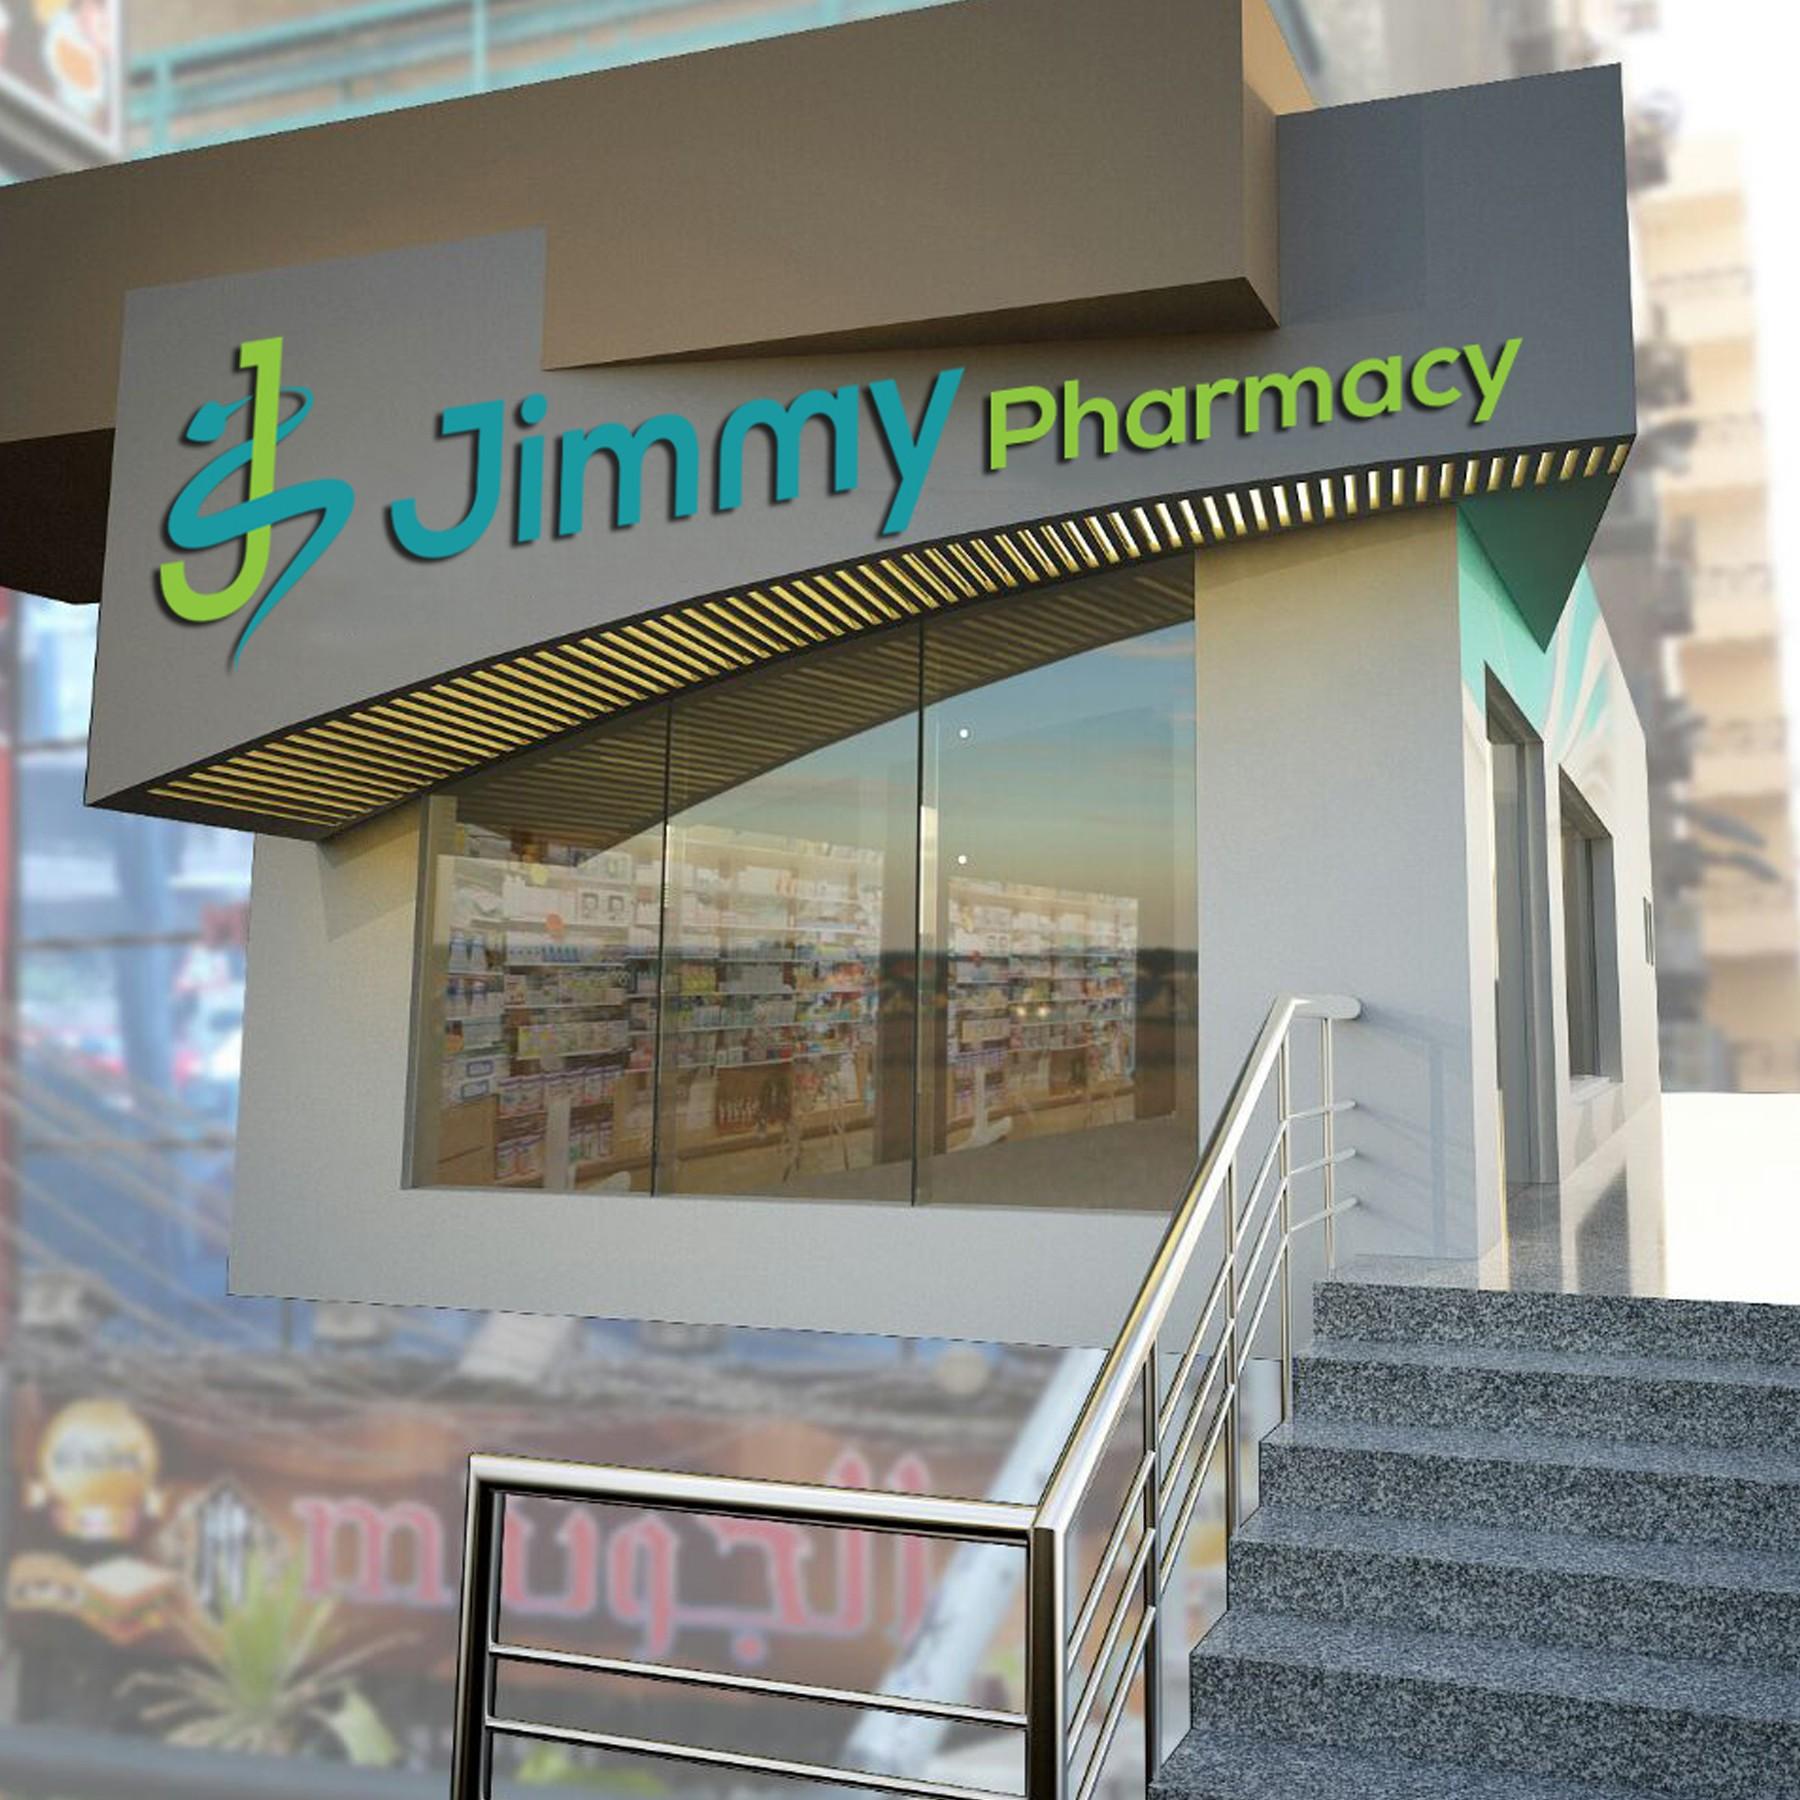 Jimmy Pharmacy